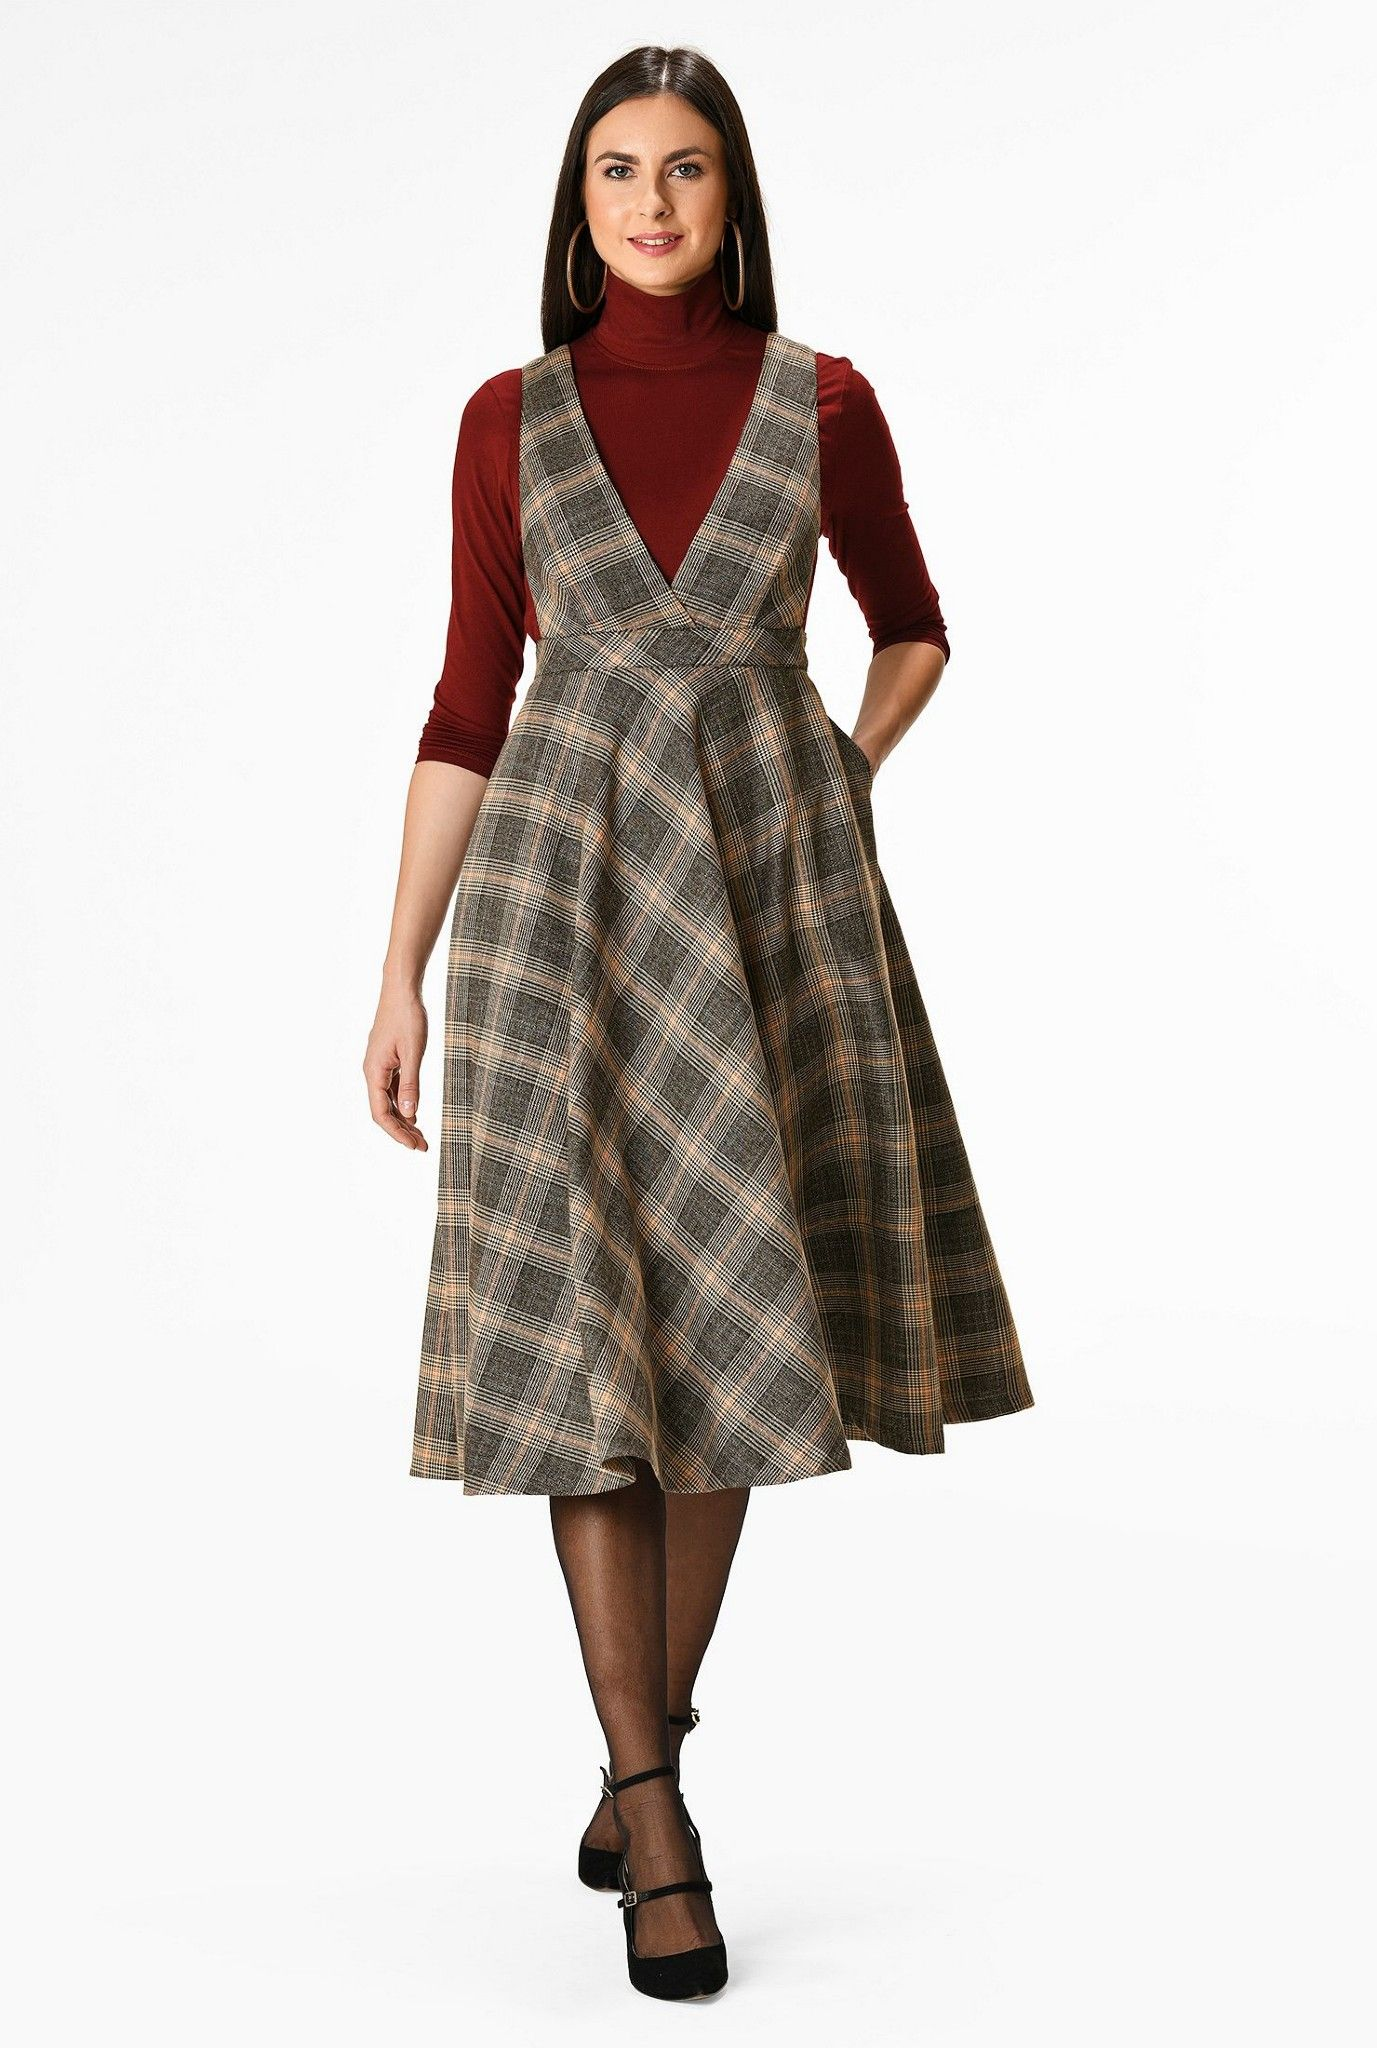 38+ Womens jumper dress ideas